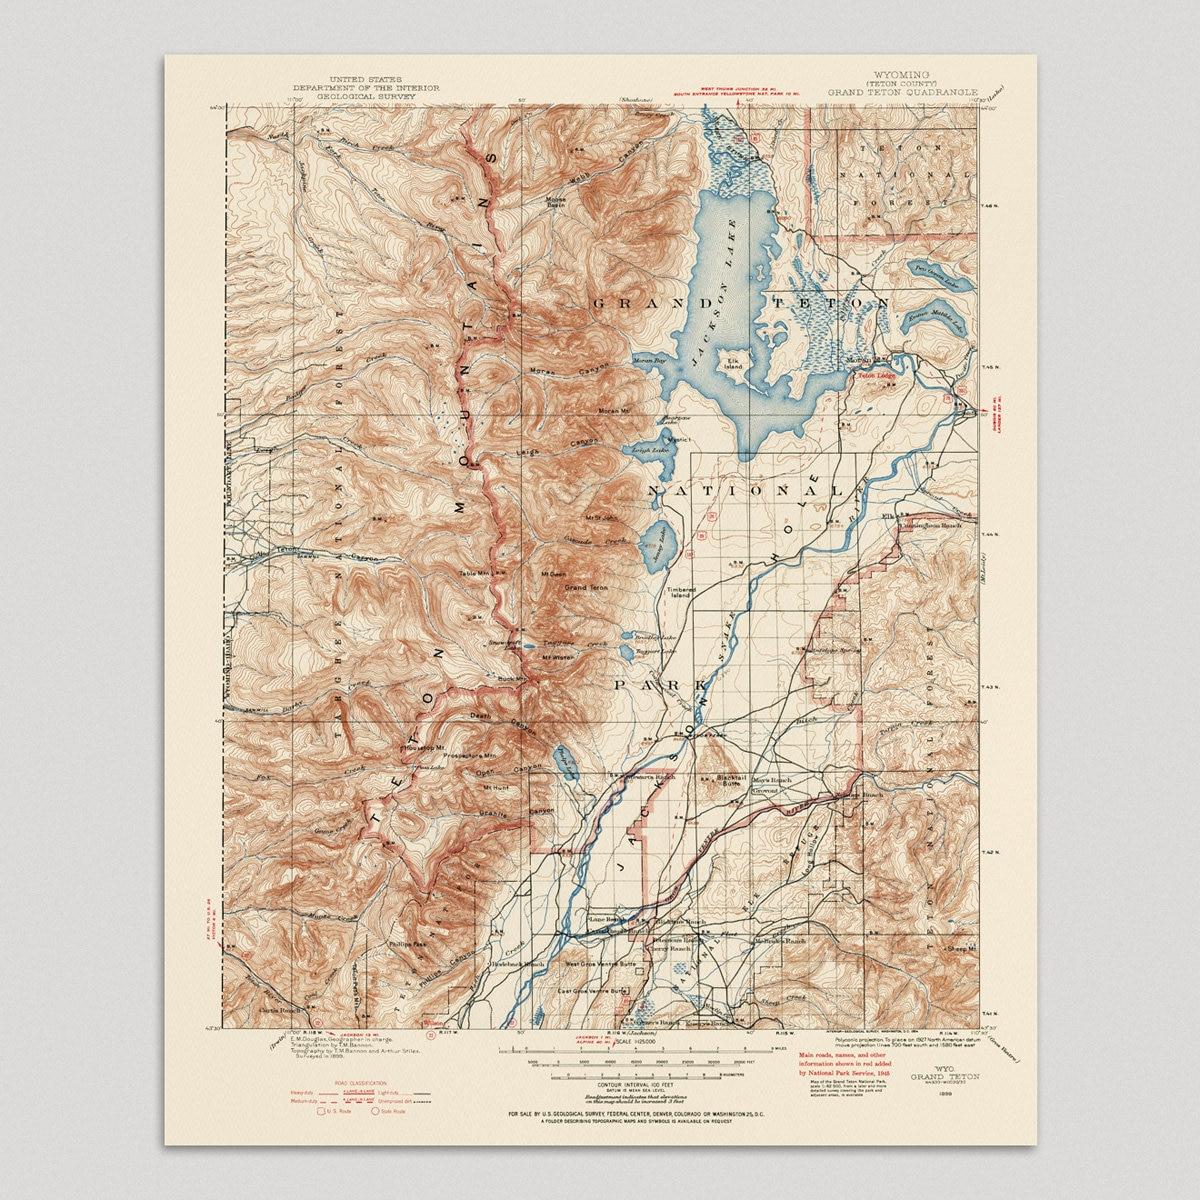 Grand Teton National Park Map Art Print 1899 Old Antique Map | Etsy